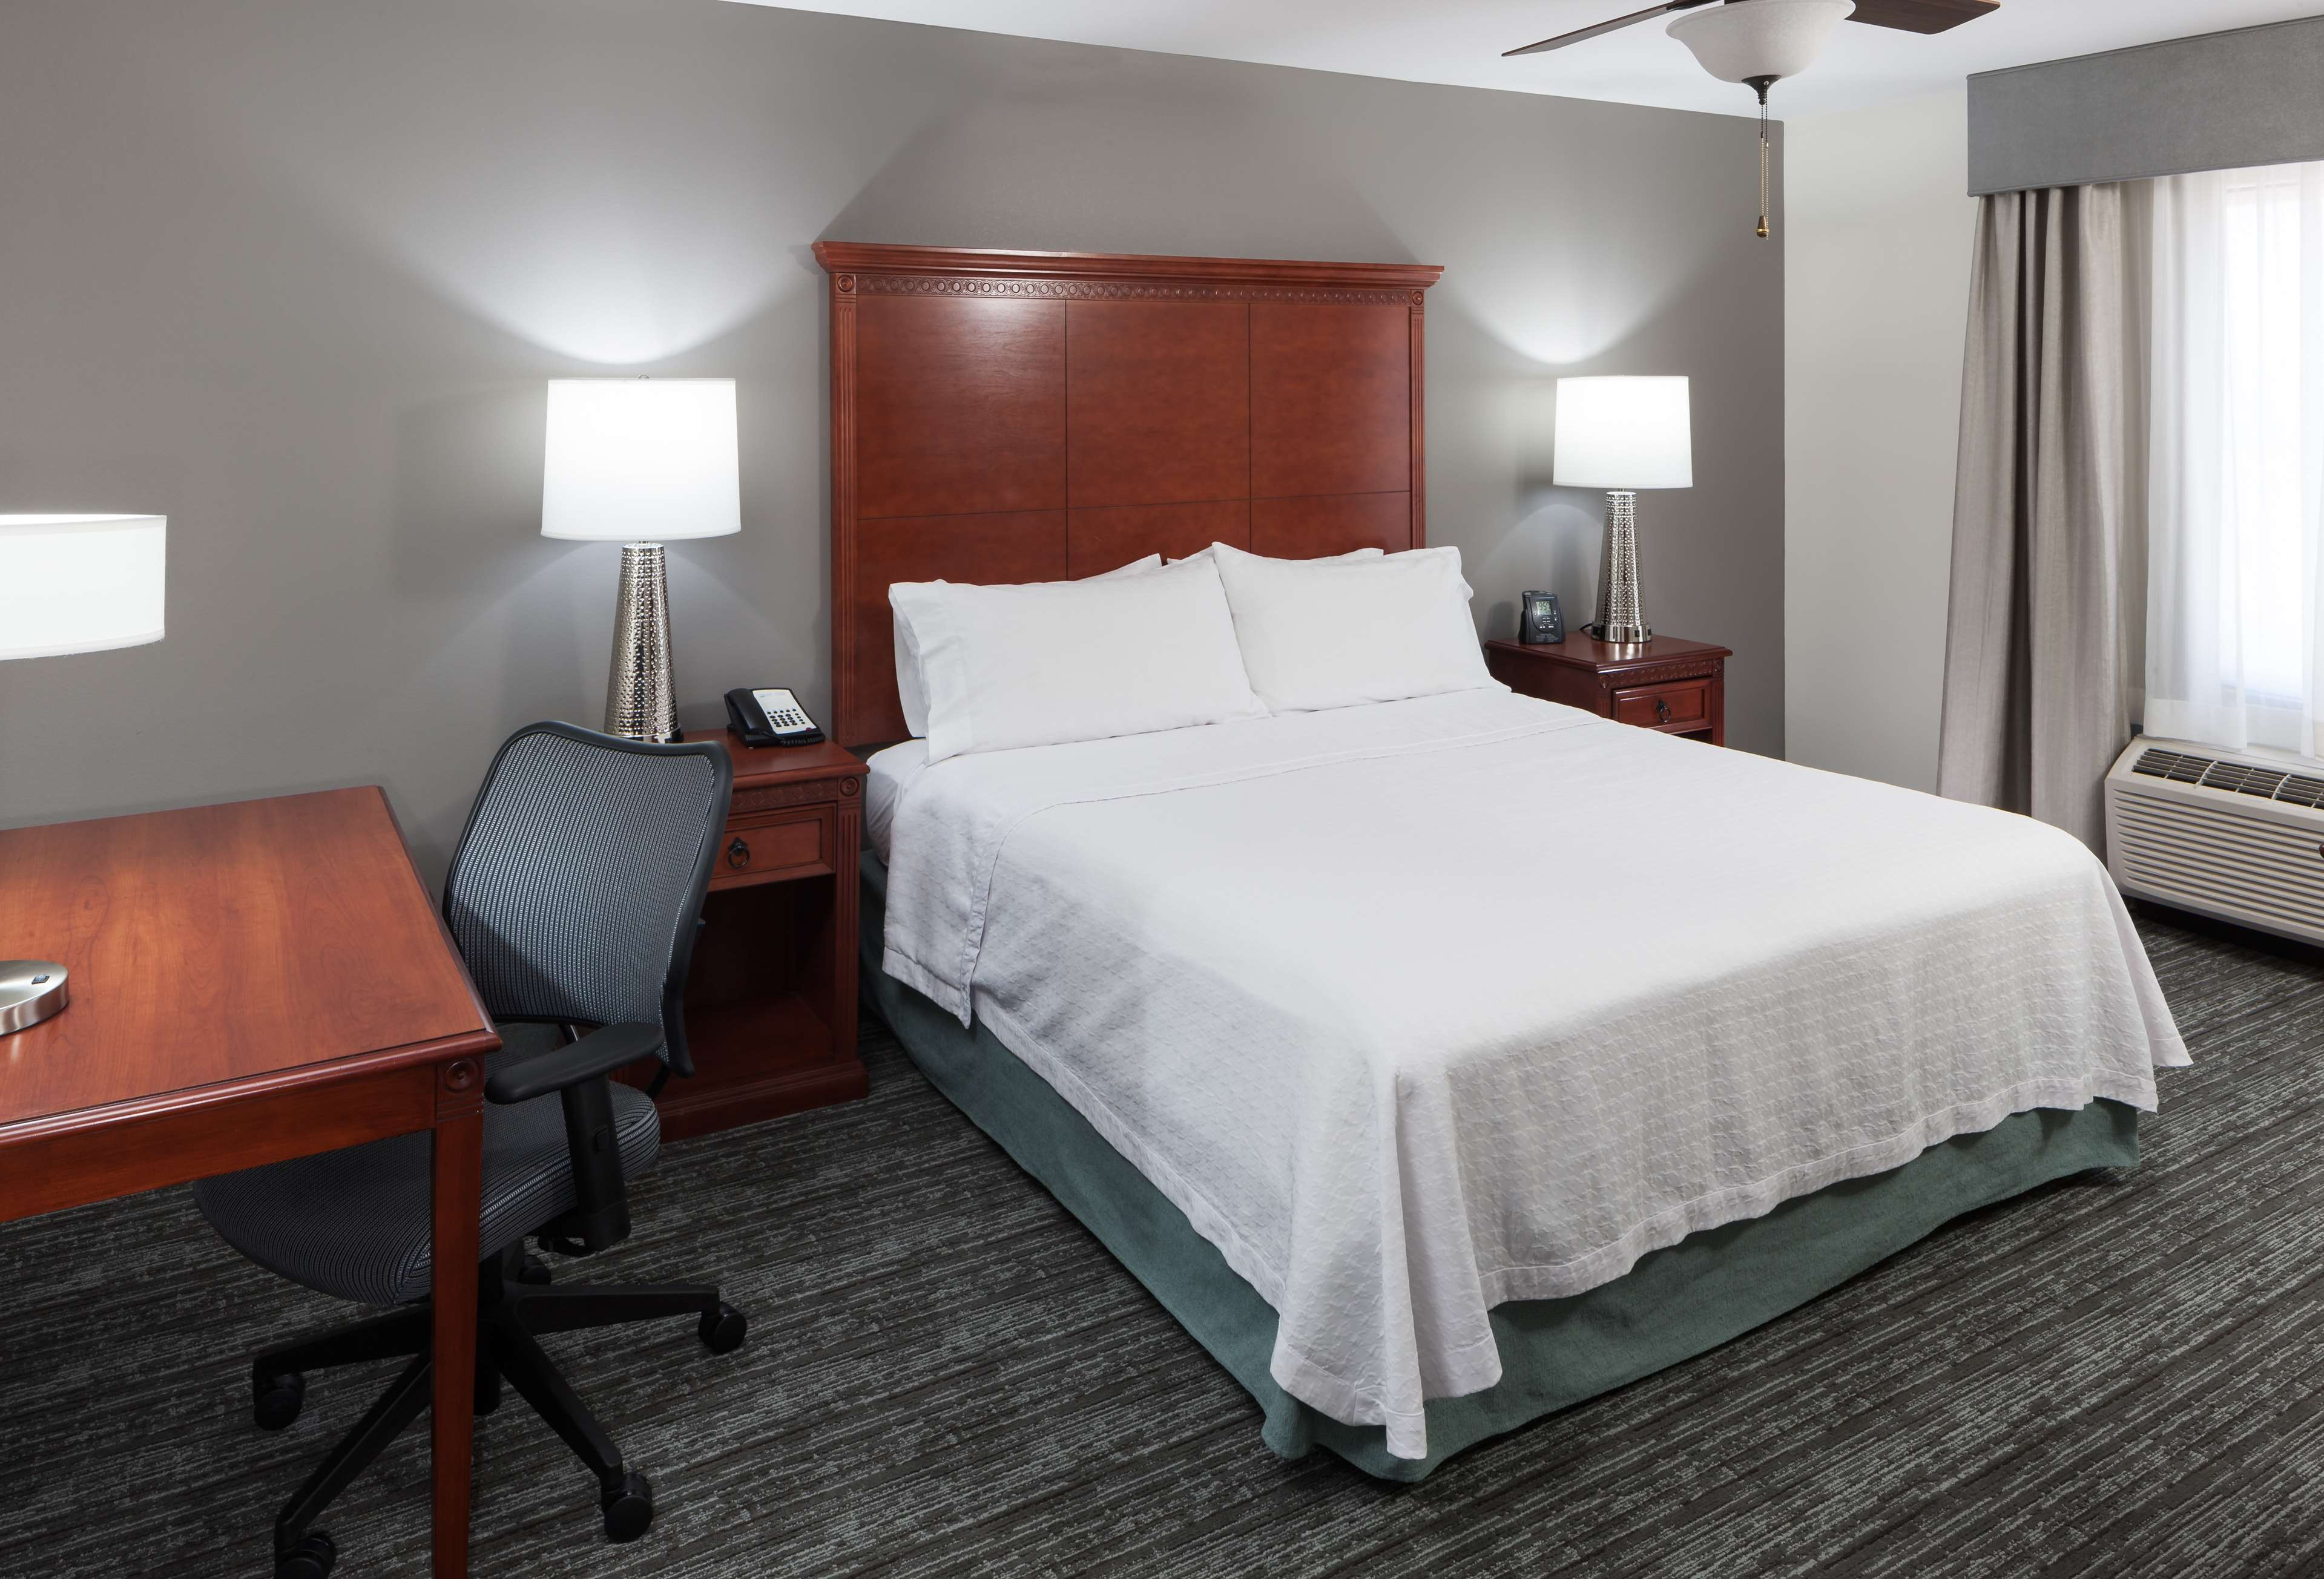 Homewood Suites by Hilton Denton image 23